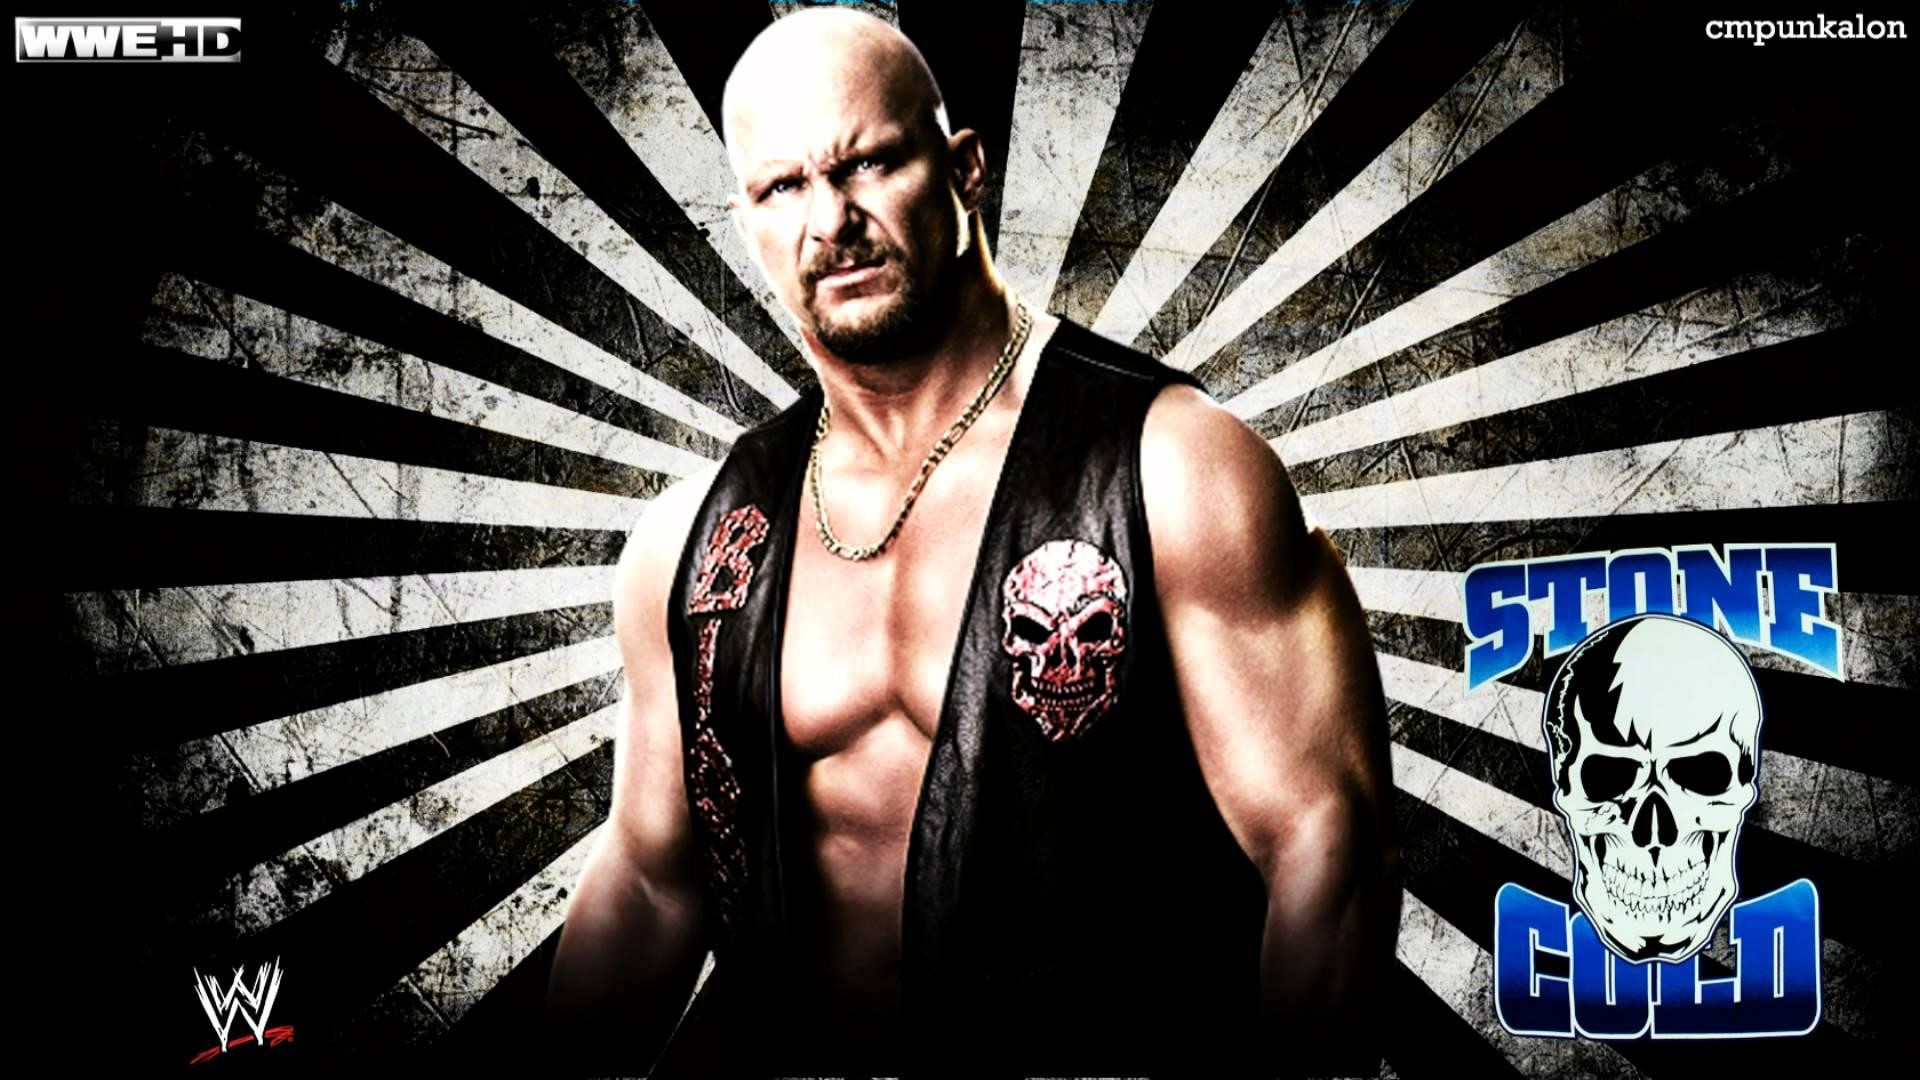 WWE wallpaper 1920x1080 73478 1920x1080